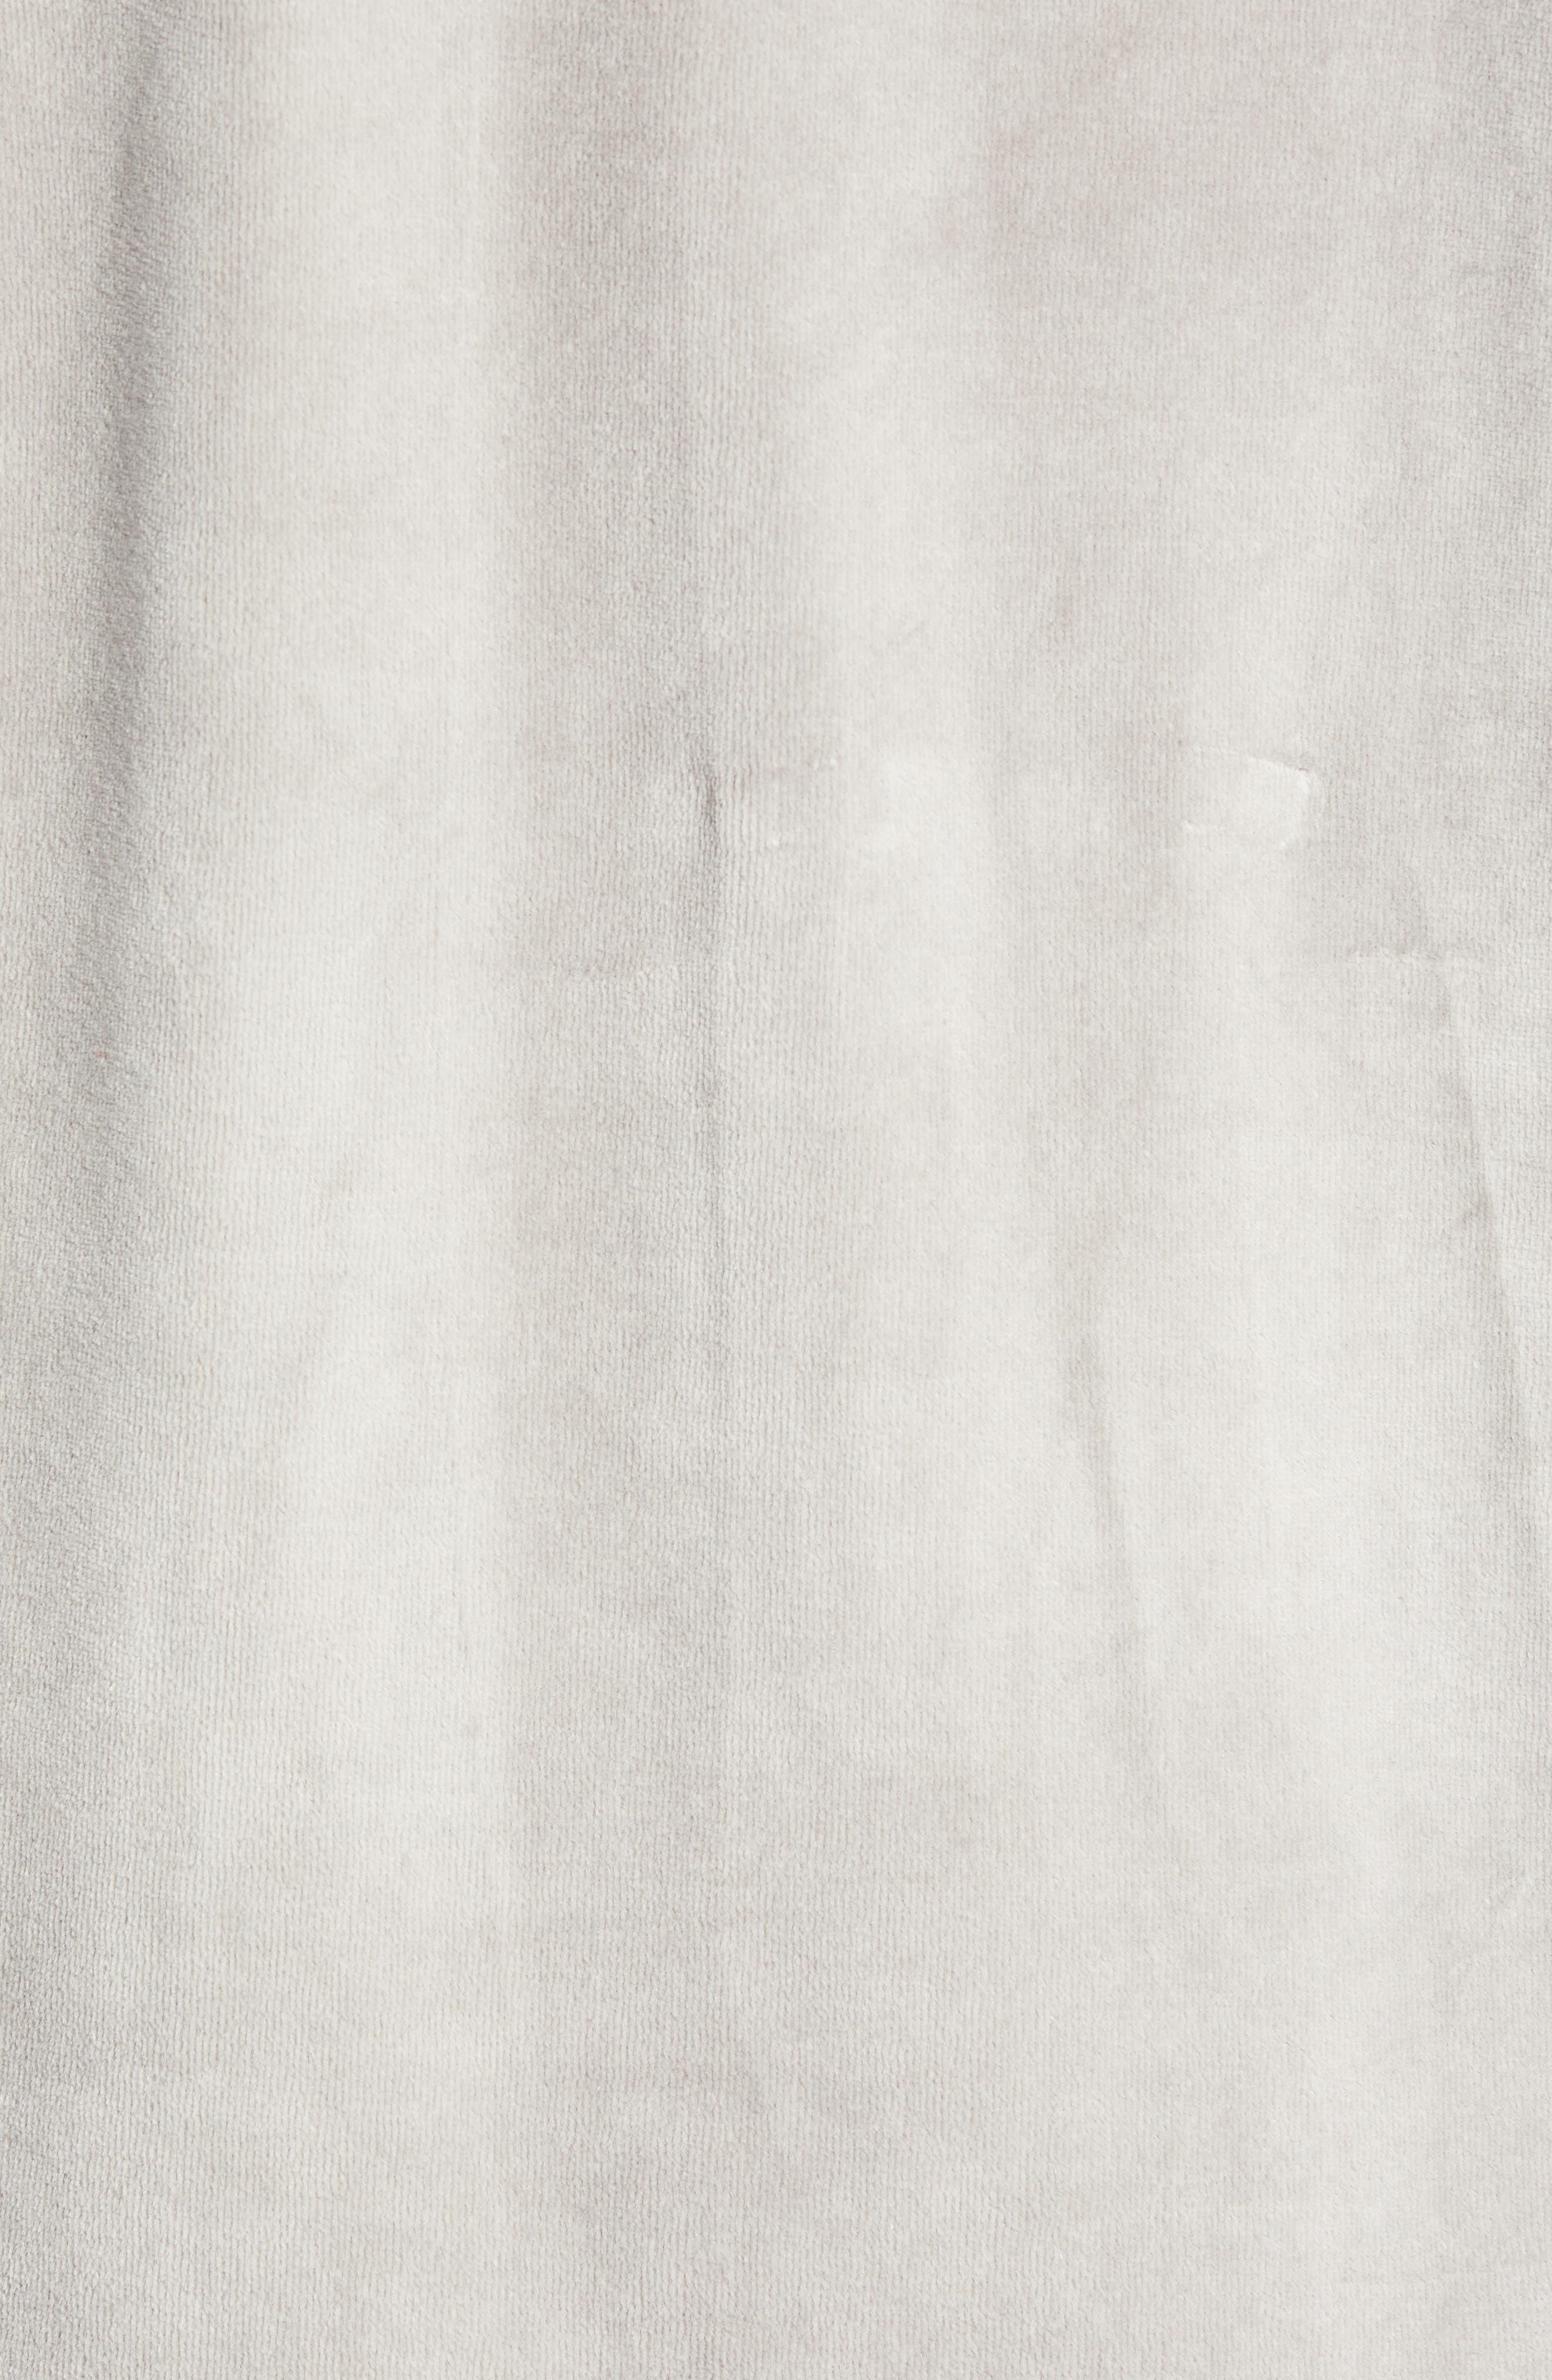 Authentic Aynset Velour Crewneck Sweatshirt,                             Alternate thumbnail 5, color,                             GREY MIST/ BLACK/ WHITE